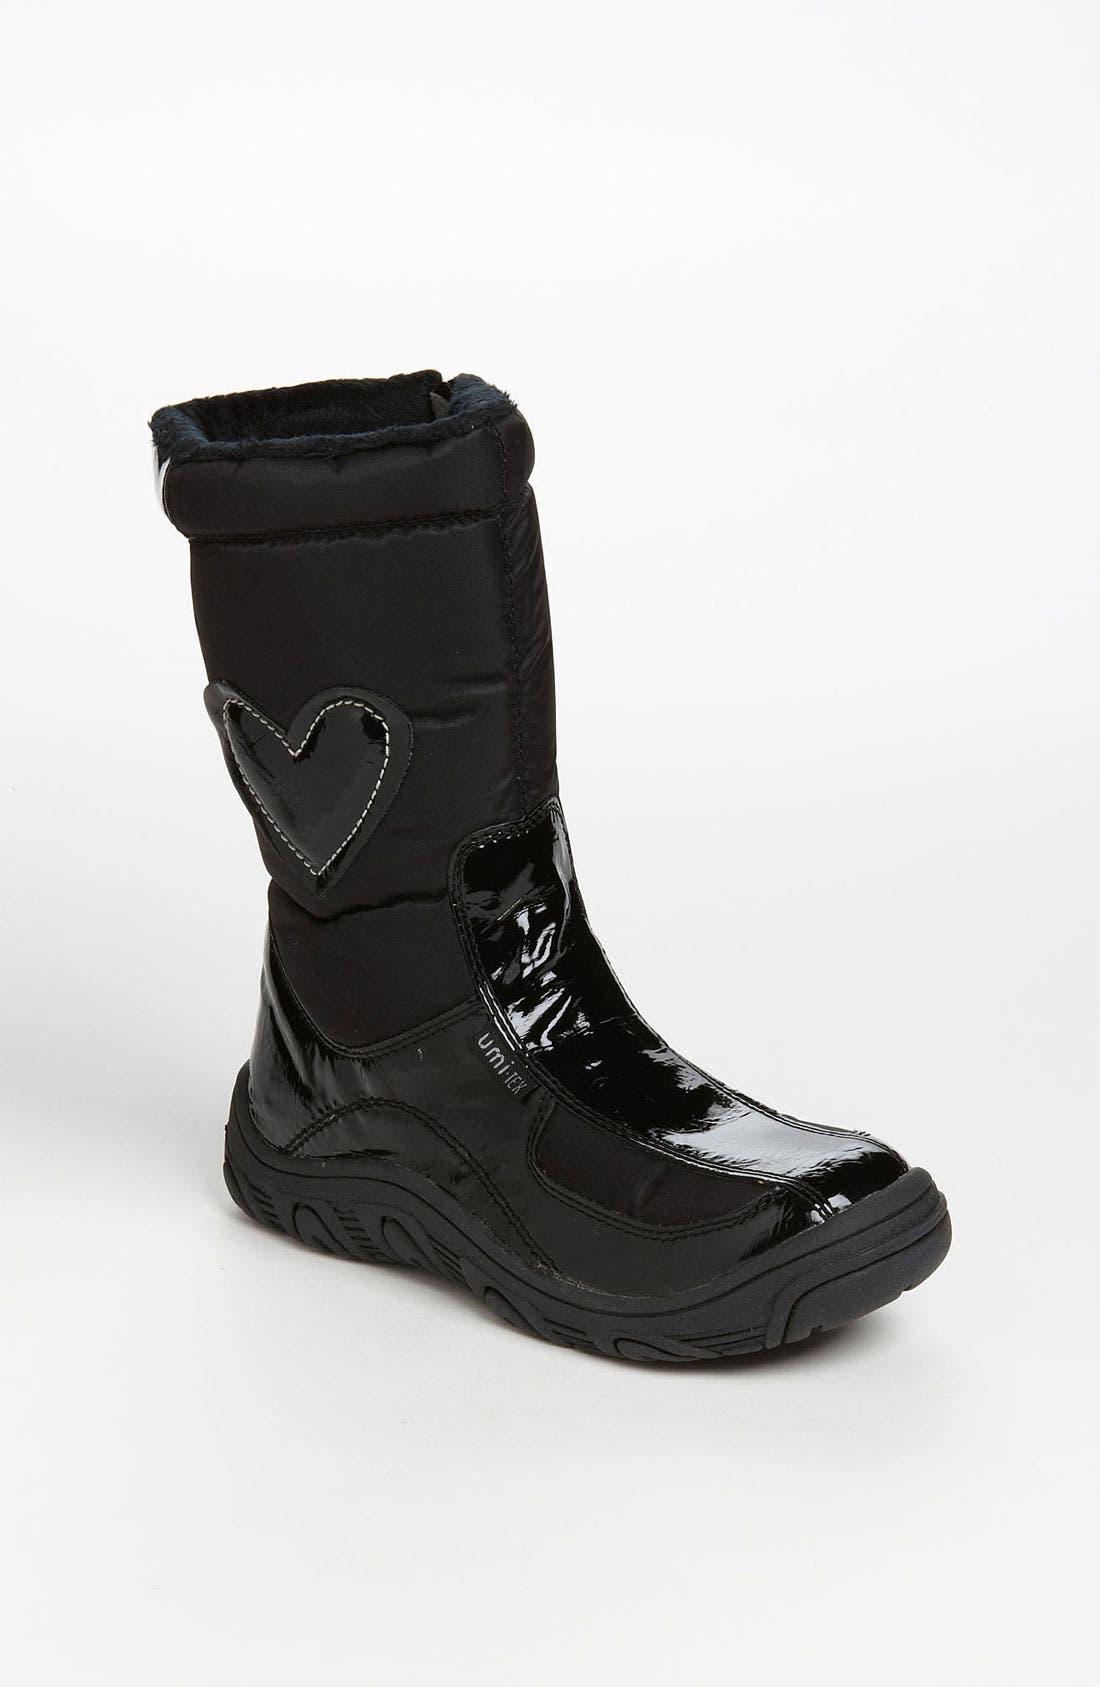 Main Image - Umi Waterproof Boot (Toddler, Little Kid & Big Kid)